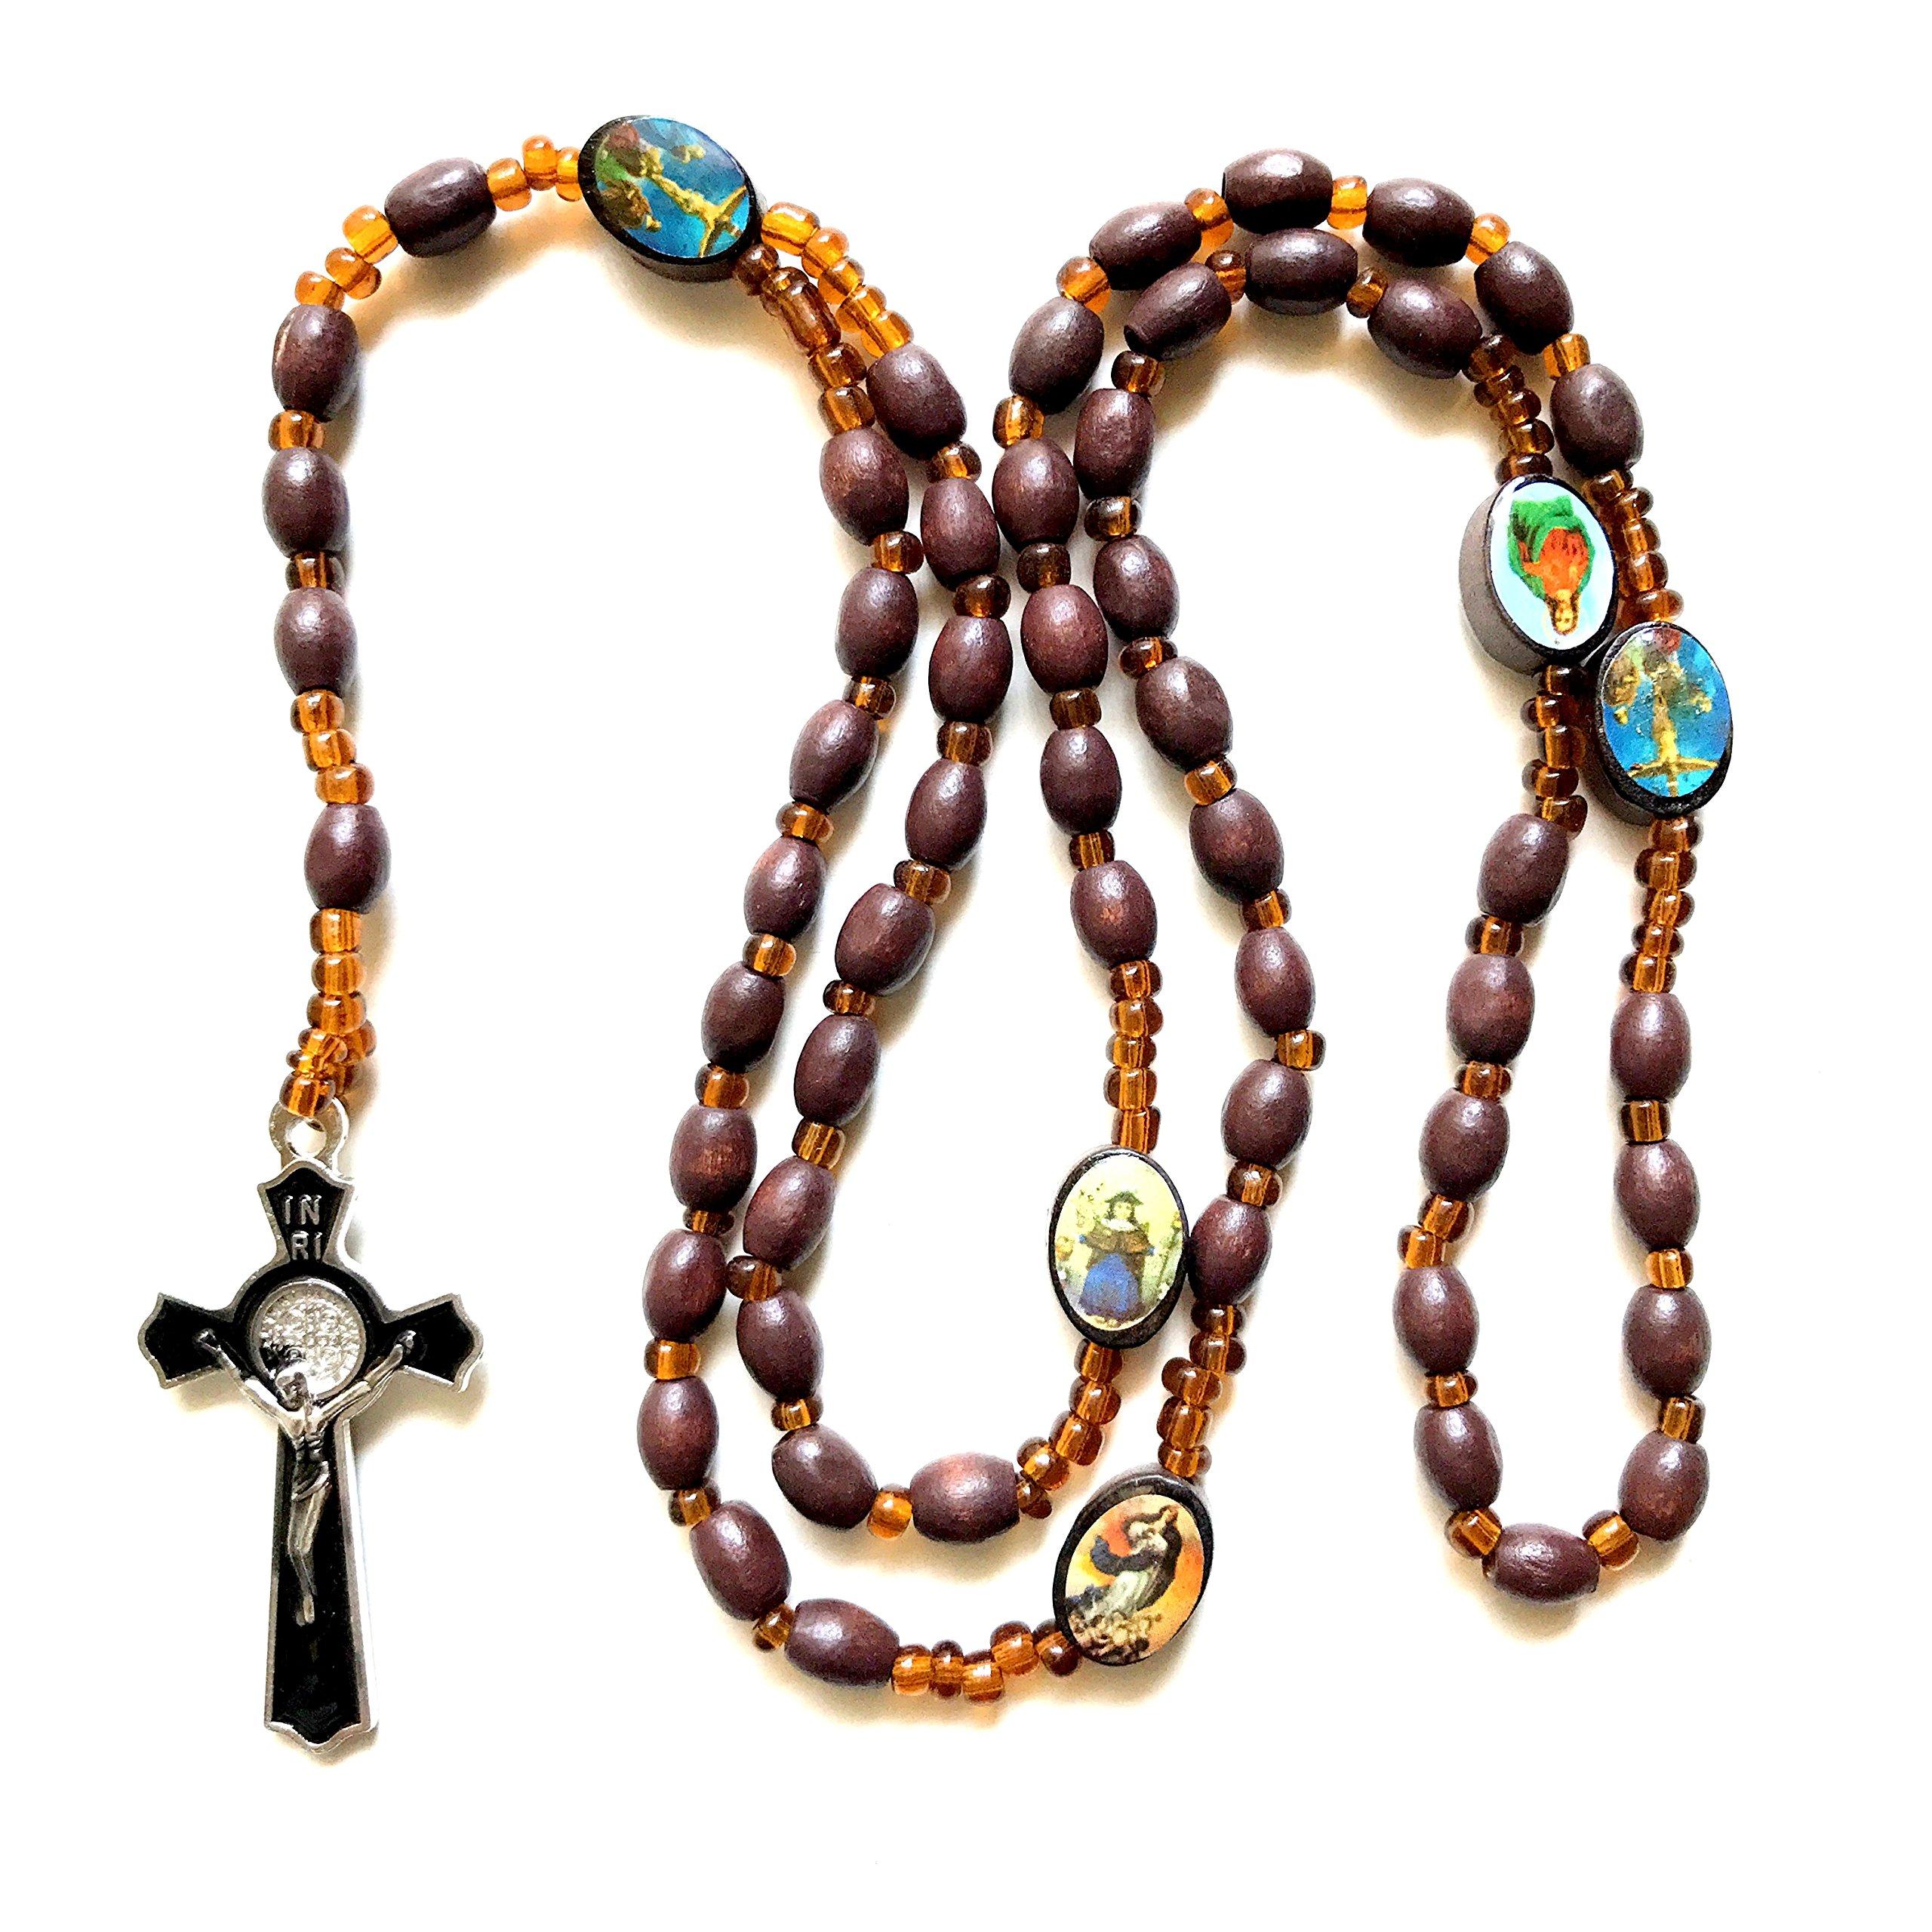 Cheap Jesus Necklace Wood Find Jesus Necklace Wood Deals On Line At